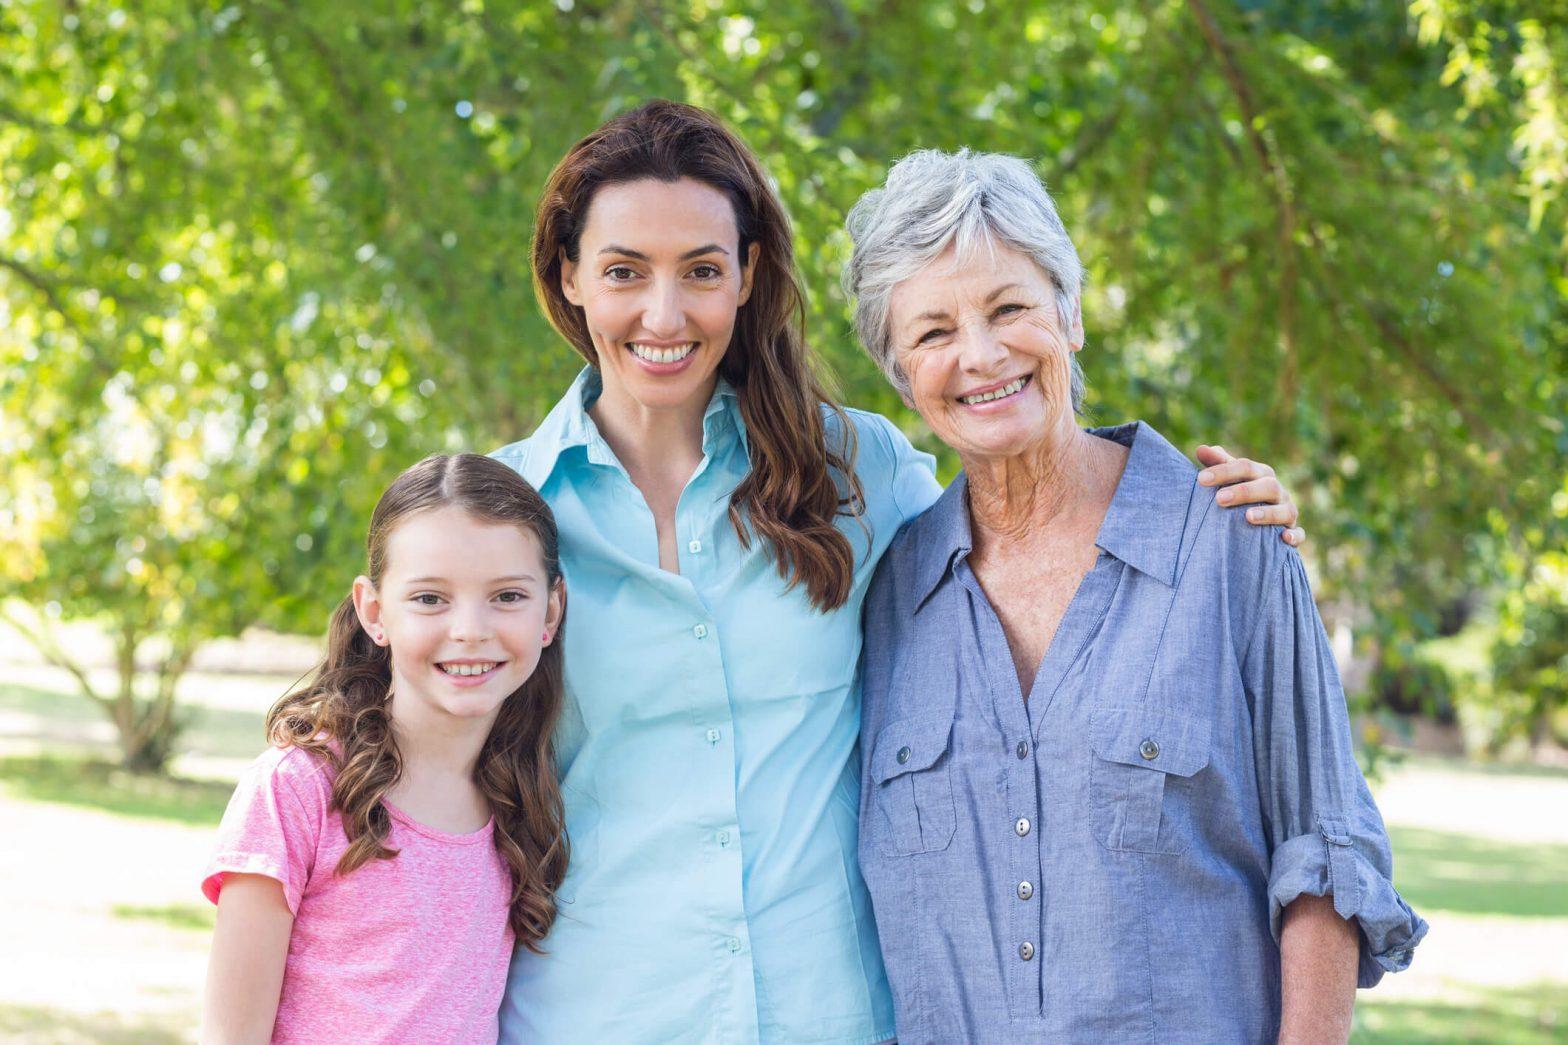 Three women smiling with white teeth